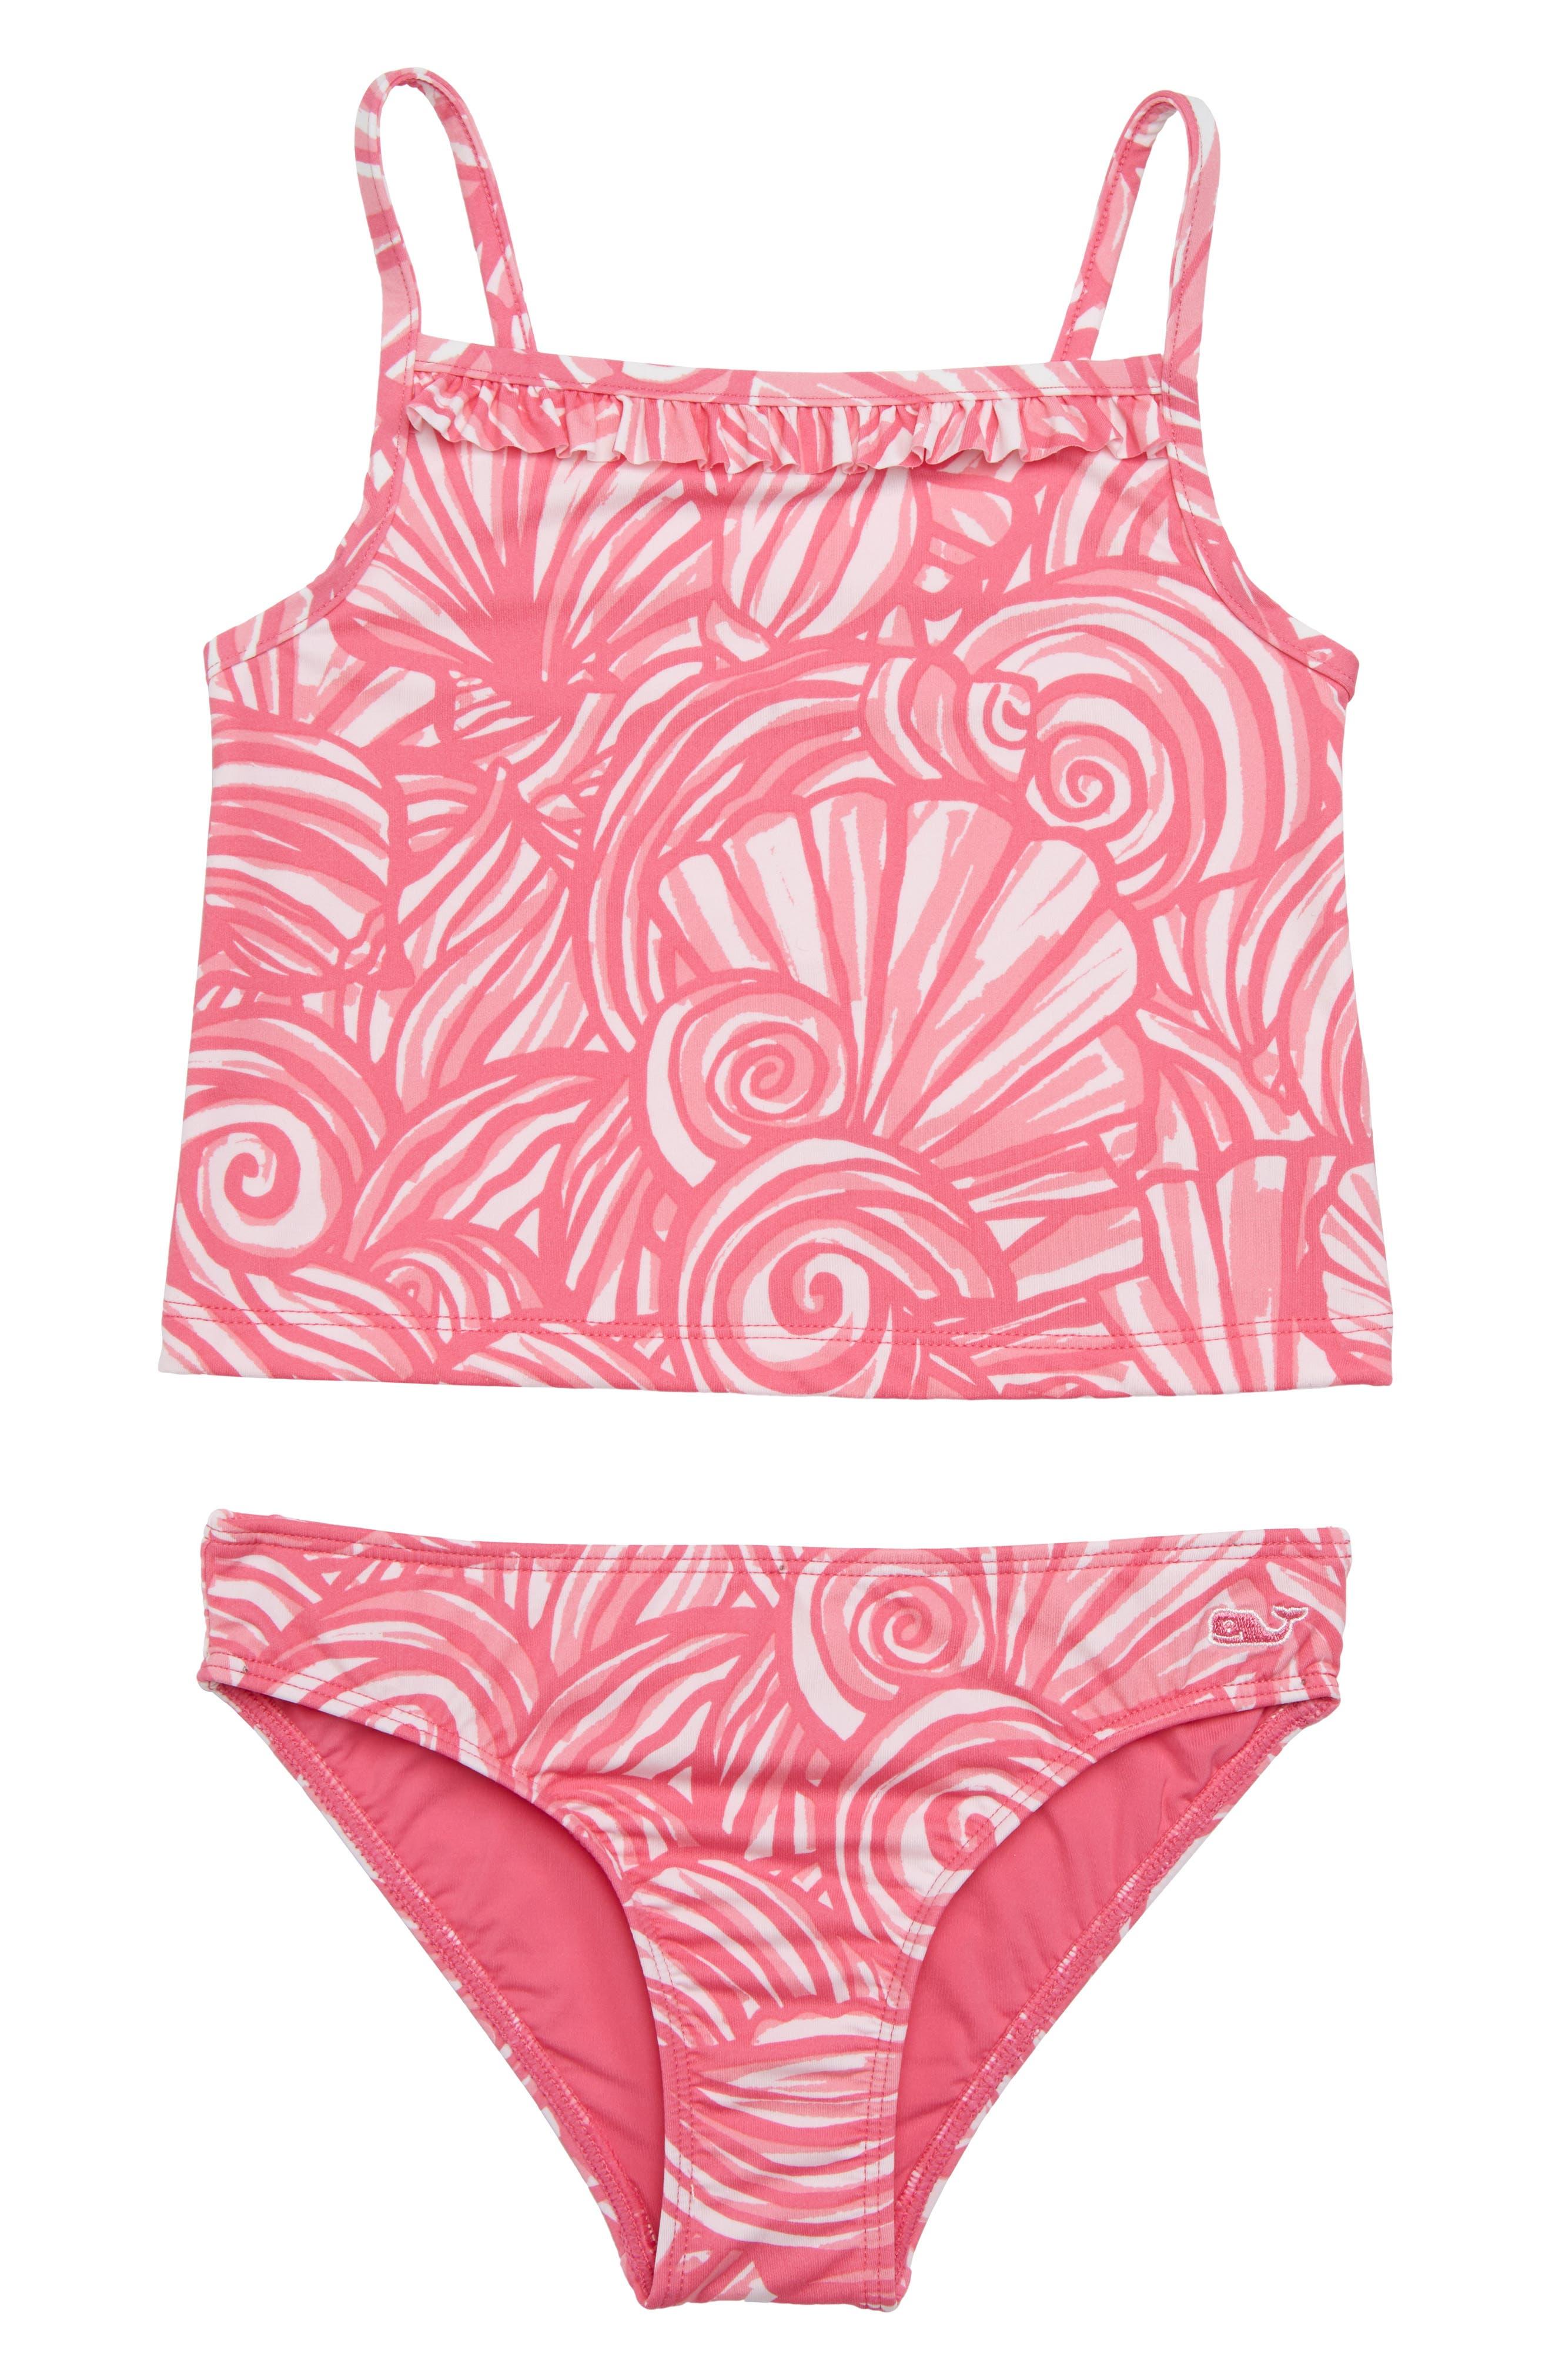 VINEYARD VINES,                             Shell Two-Piece Tankini Swimsuit,                             Main thumbnail 1, color,                             673